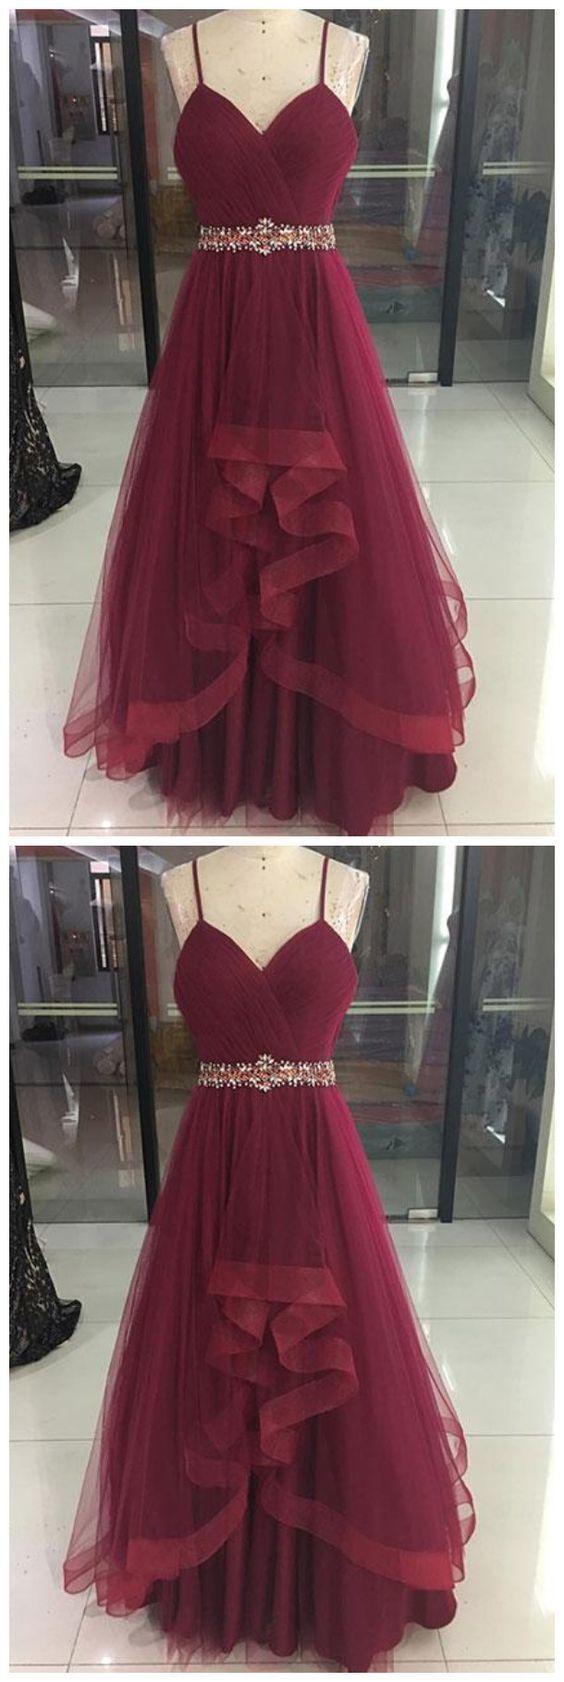 Sexy Burgundy V-Neck Tulle Prom Dress,Spaghetti Straps Burgundy Evening Dress